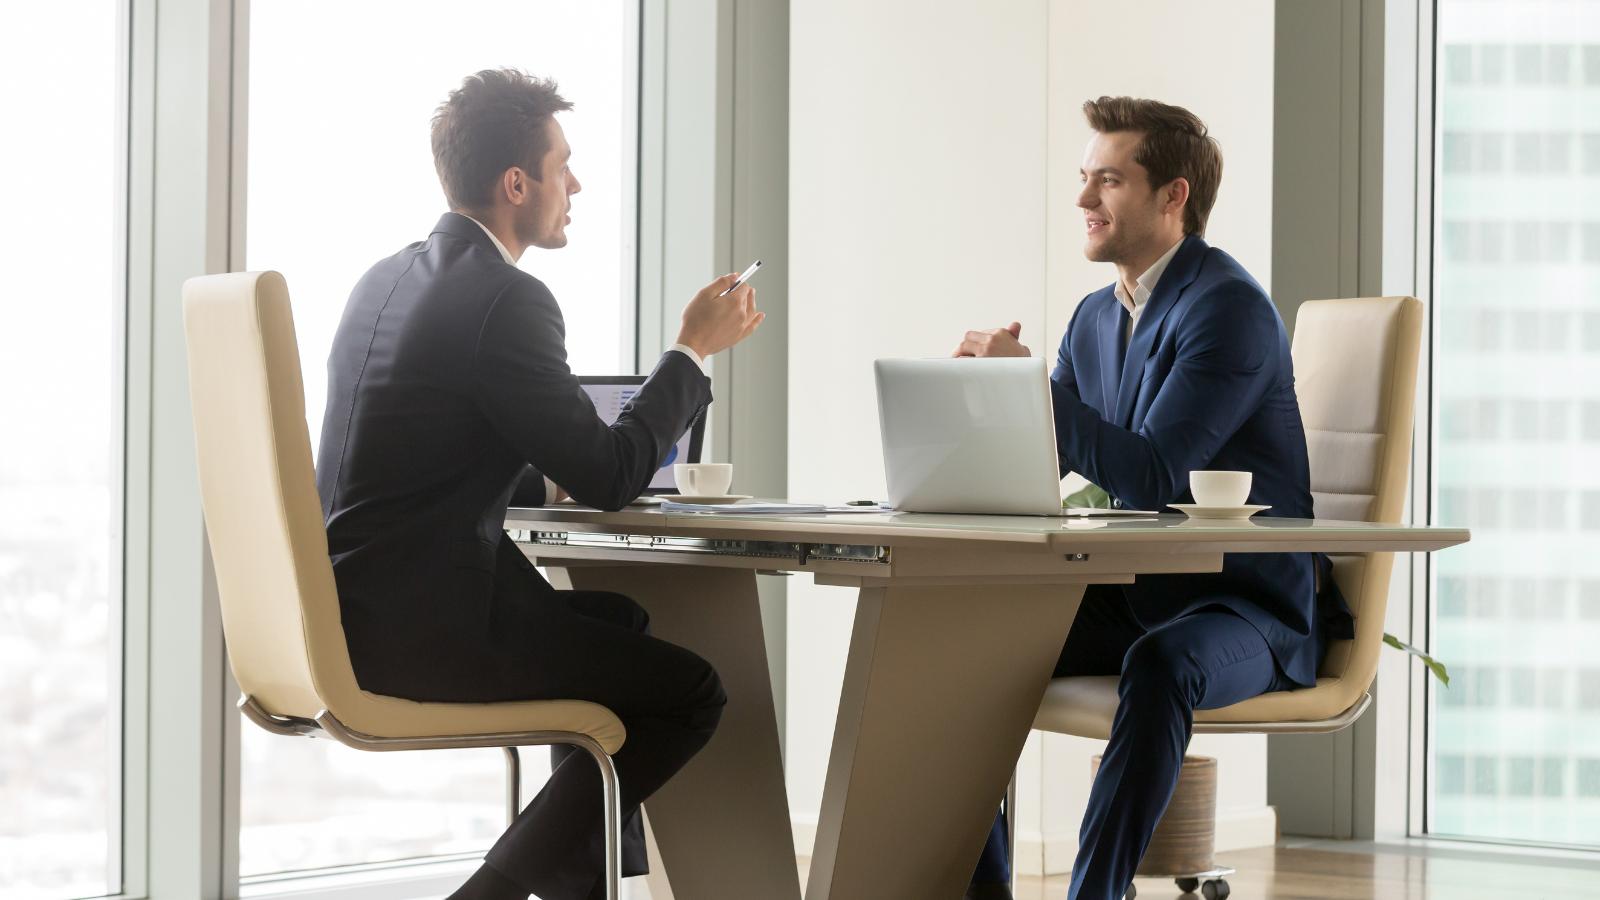 communication-skills-enhance-your-value